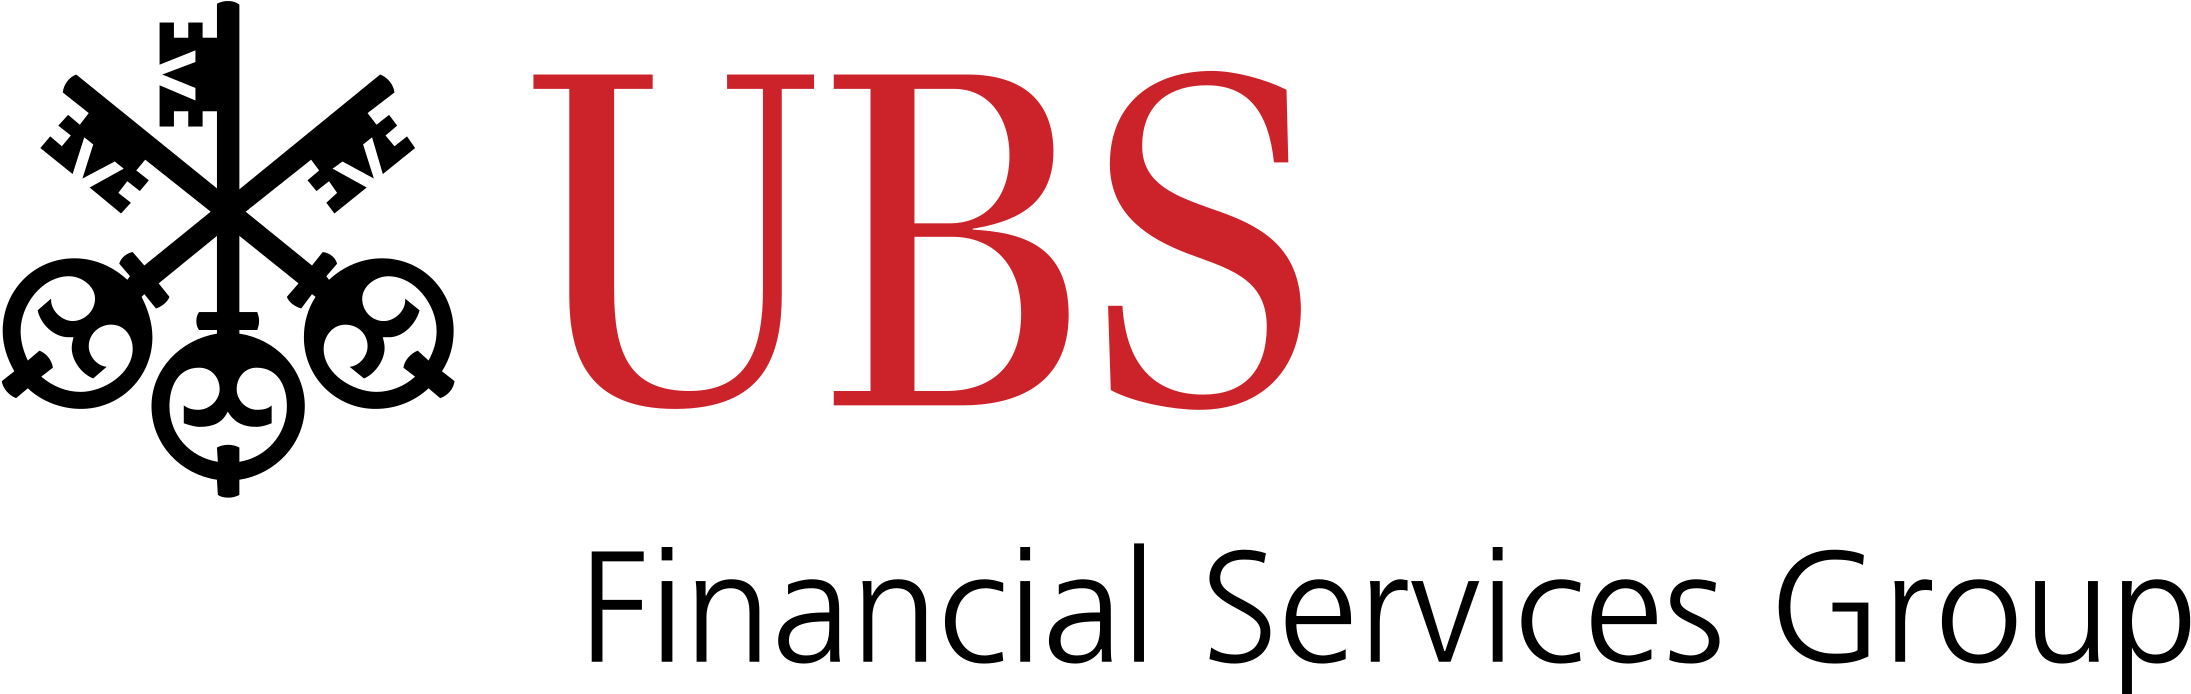 Download Ubs Logo Png Transparent - Ubs Financial Services